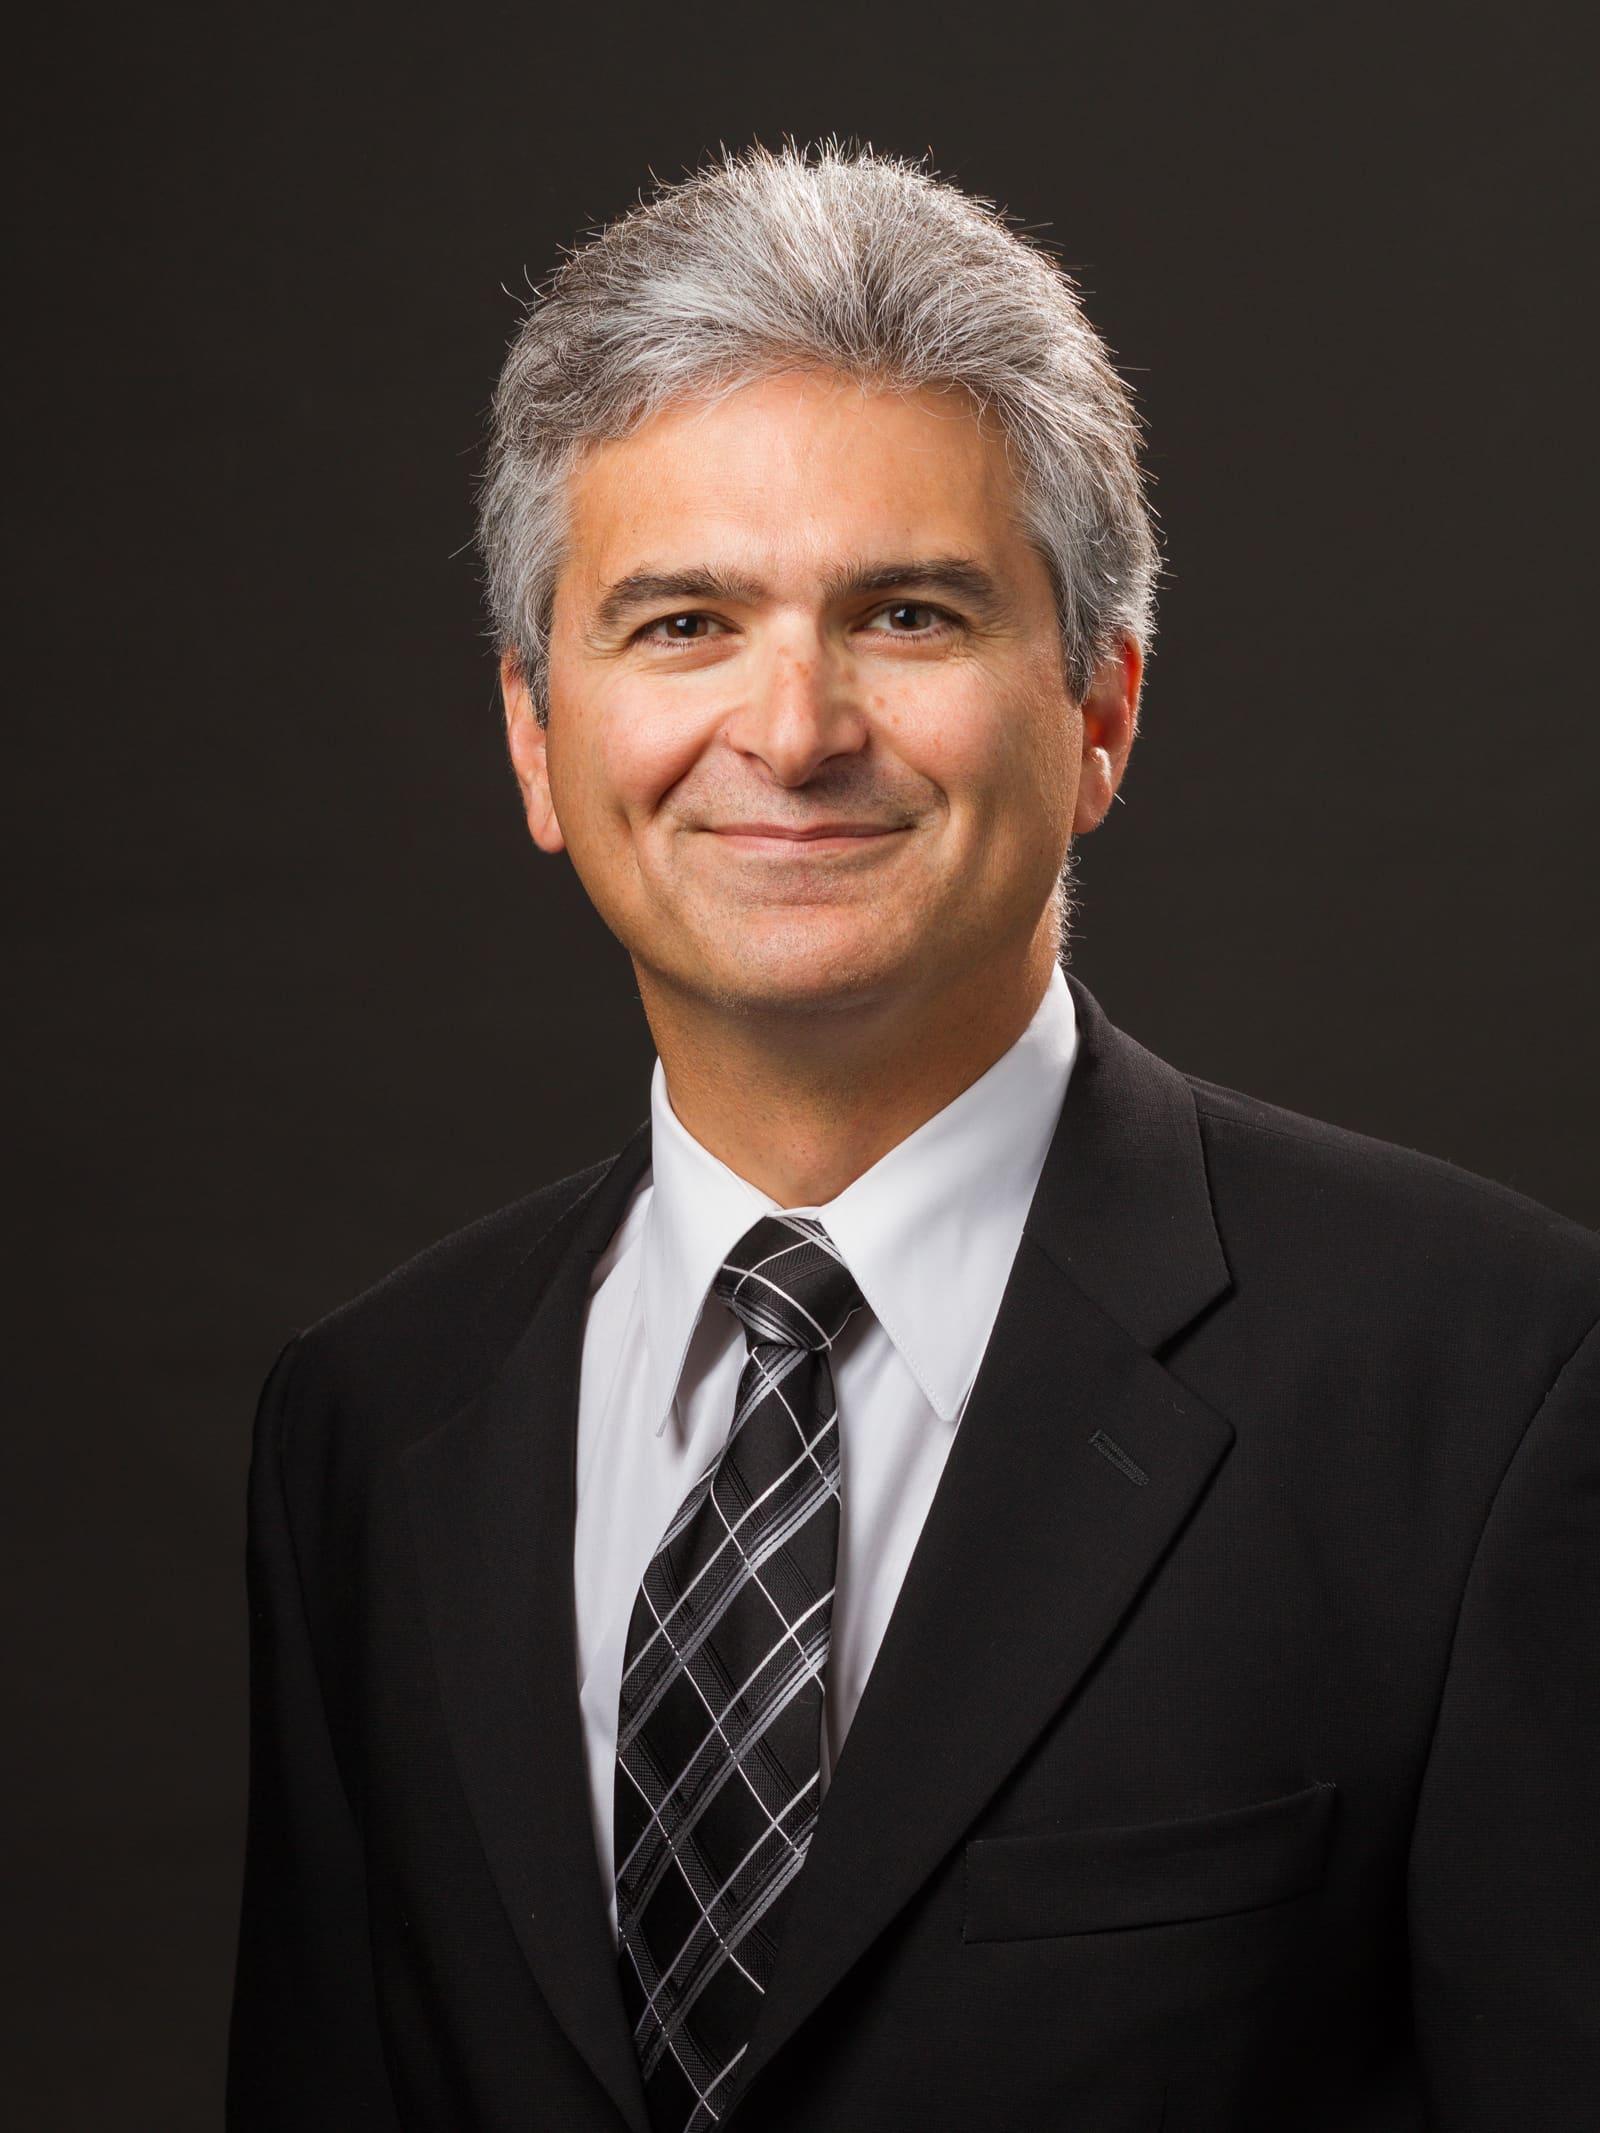 Christopher Loscalzo